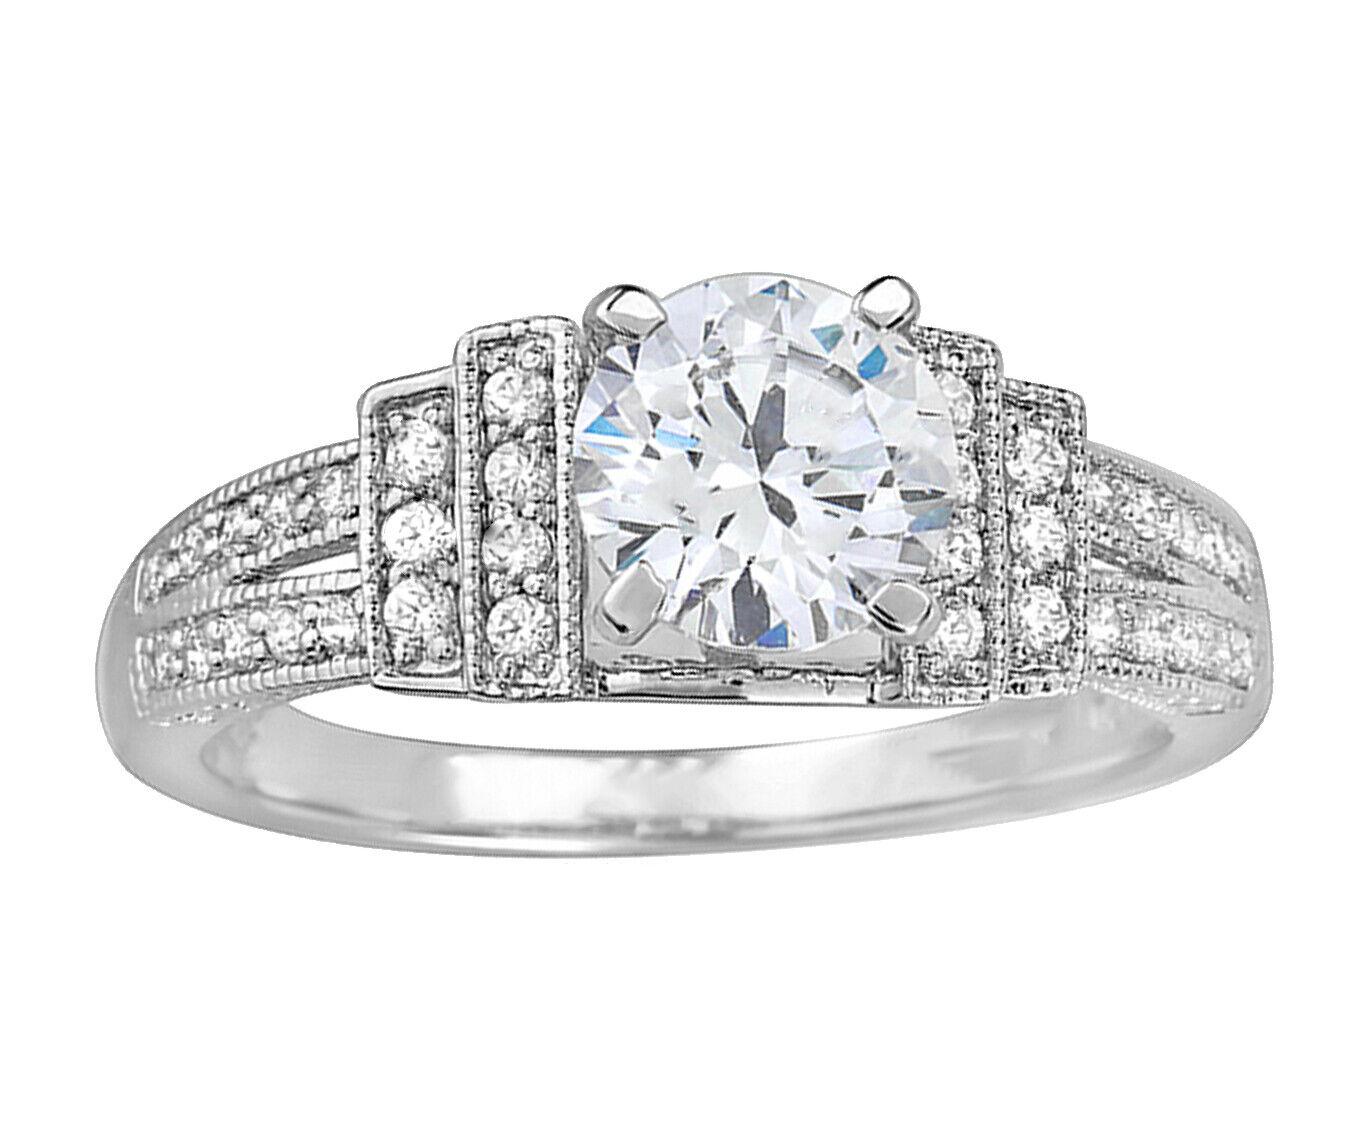 Real GIA Certified Round Diamond Engagement Ring 14k White Gold 1.67 Carat total